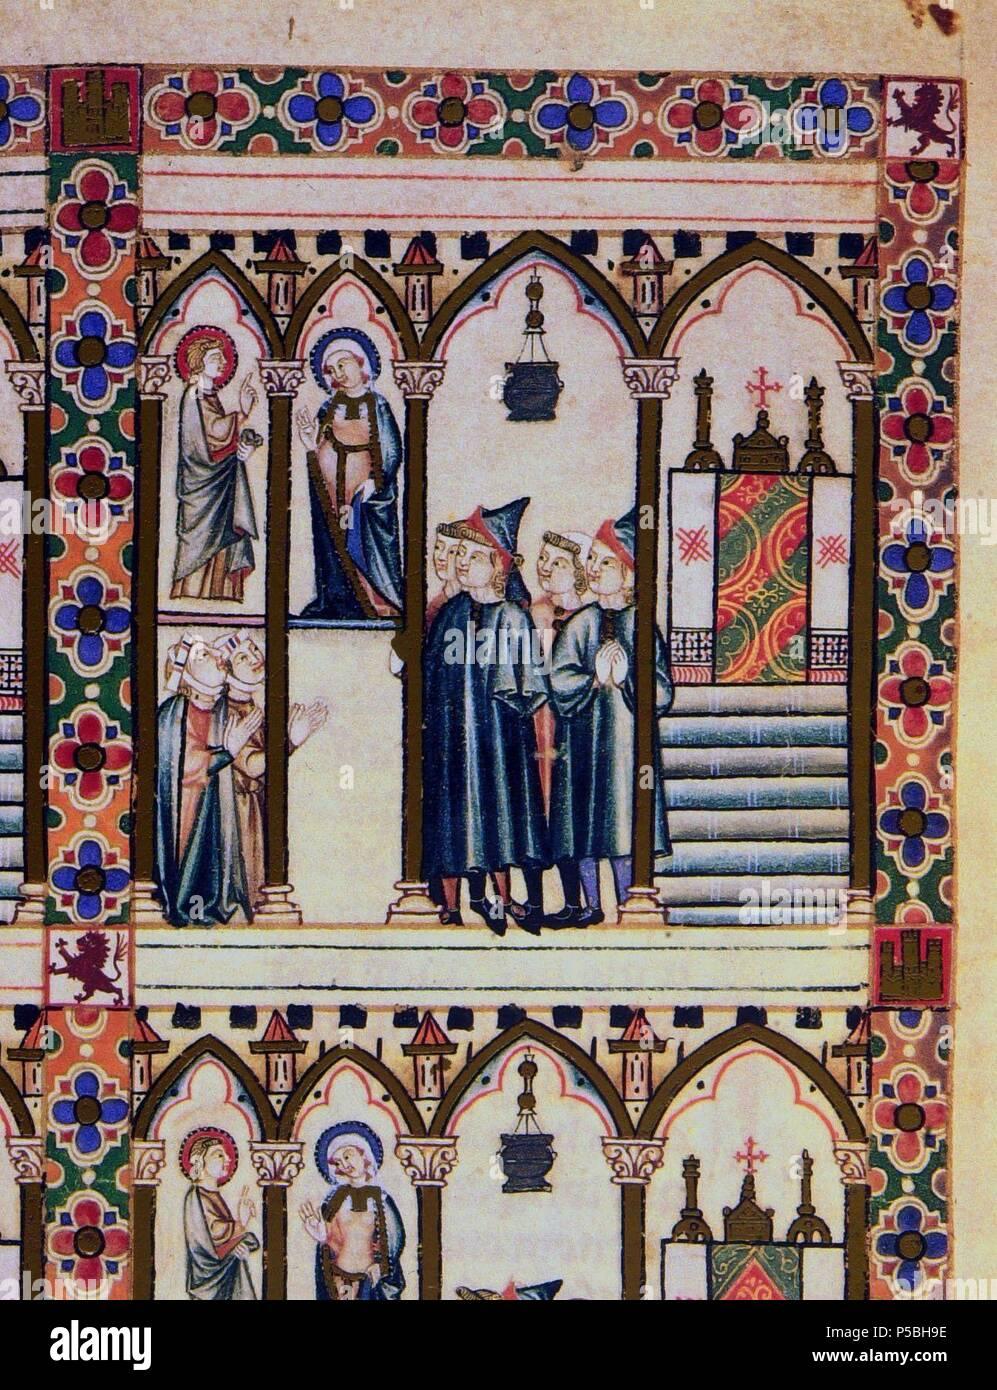 MS.B.R.20- CANTIGA STA MARIA-Nº306-F21V-B-HOMBRES CON GARNACHAS-HEREJES EN ROMA-MINIATURA S XIII. Author: Alfonso X of Castile the Wise (1221-1284). Location: BIBLIOTECA NACIONAL COLECCIÓN, FLORENZ, ITALIA. - Stock Image